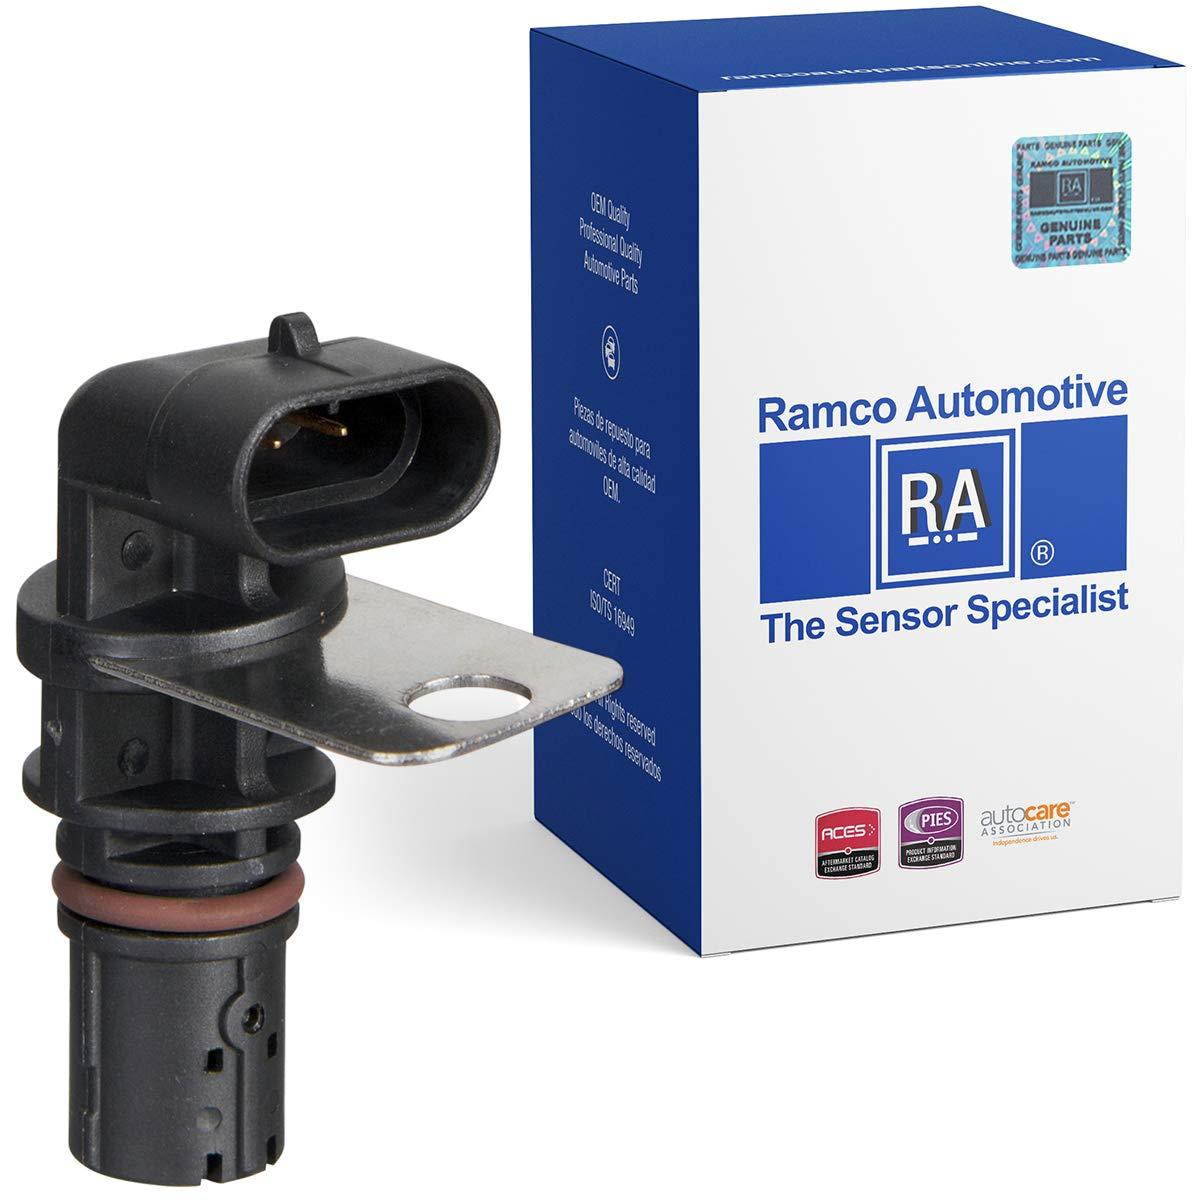 Ramco Automotive RA-CRS1014 Engine Crankshaft Position Sensor Standard Motor Products PC278 Compatible with Wells SU1178